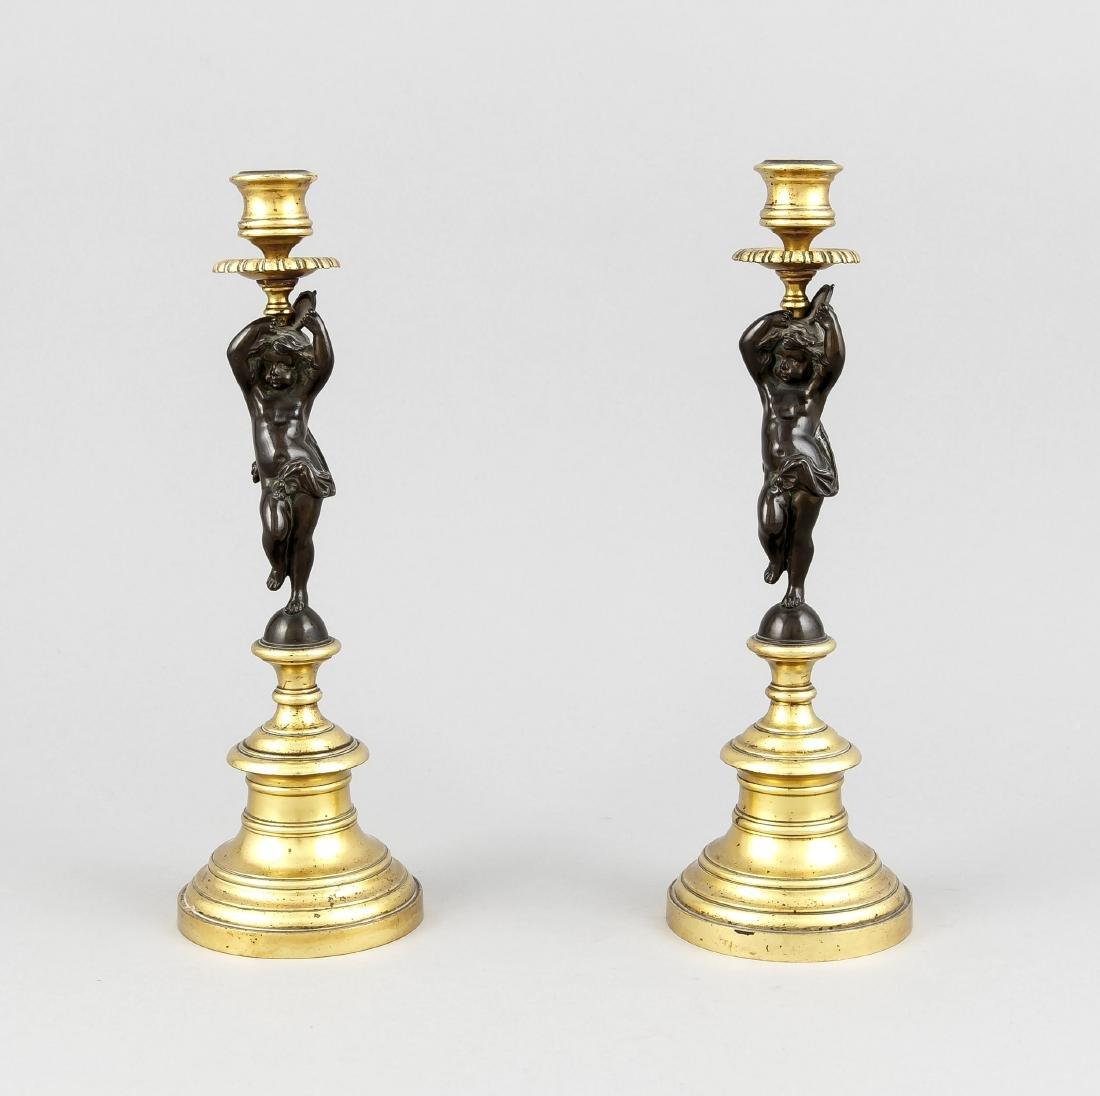 Paar figürl. Historismus-Leuchter, um 1870, Bronze,